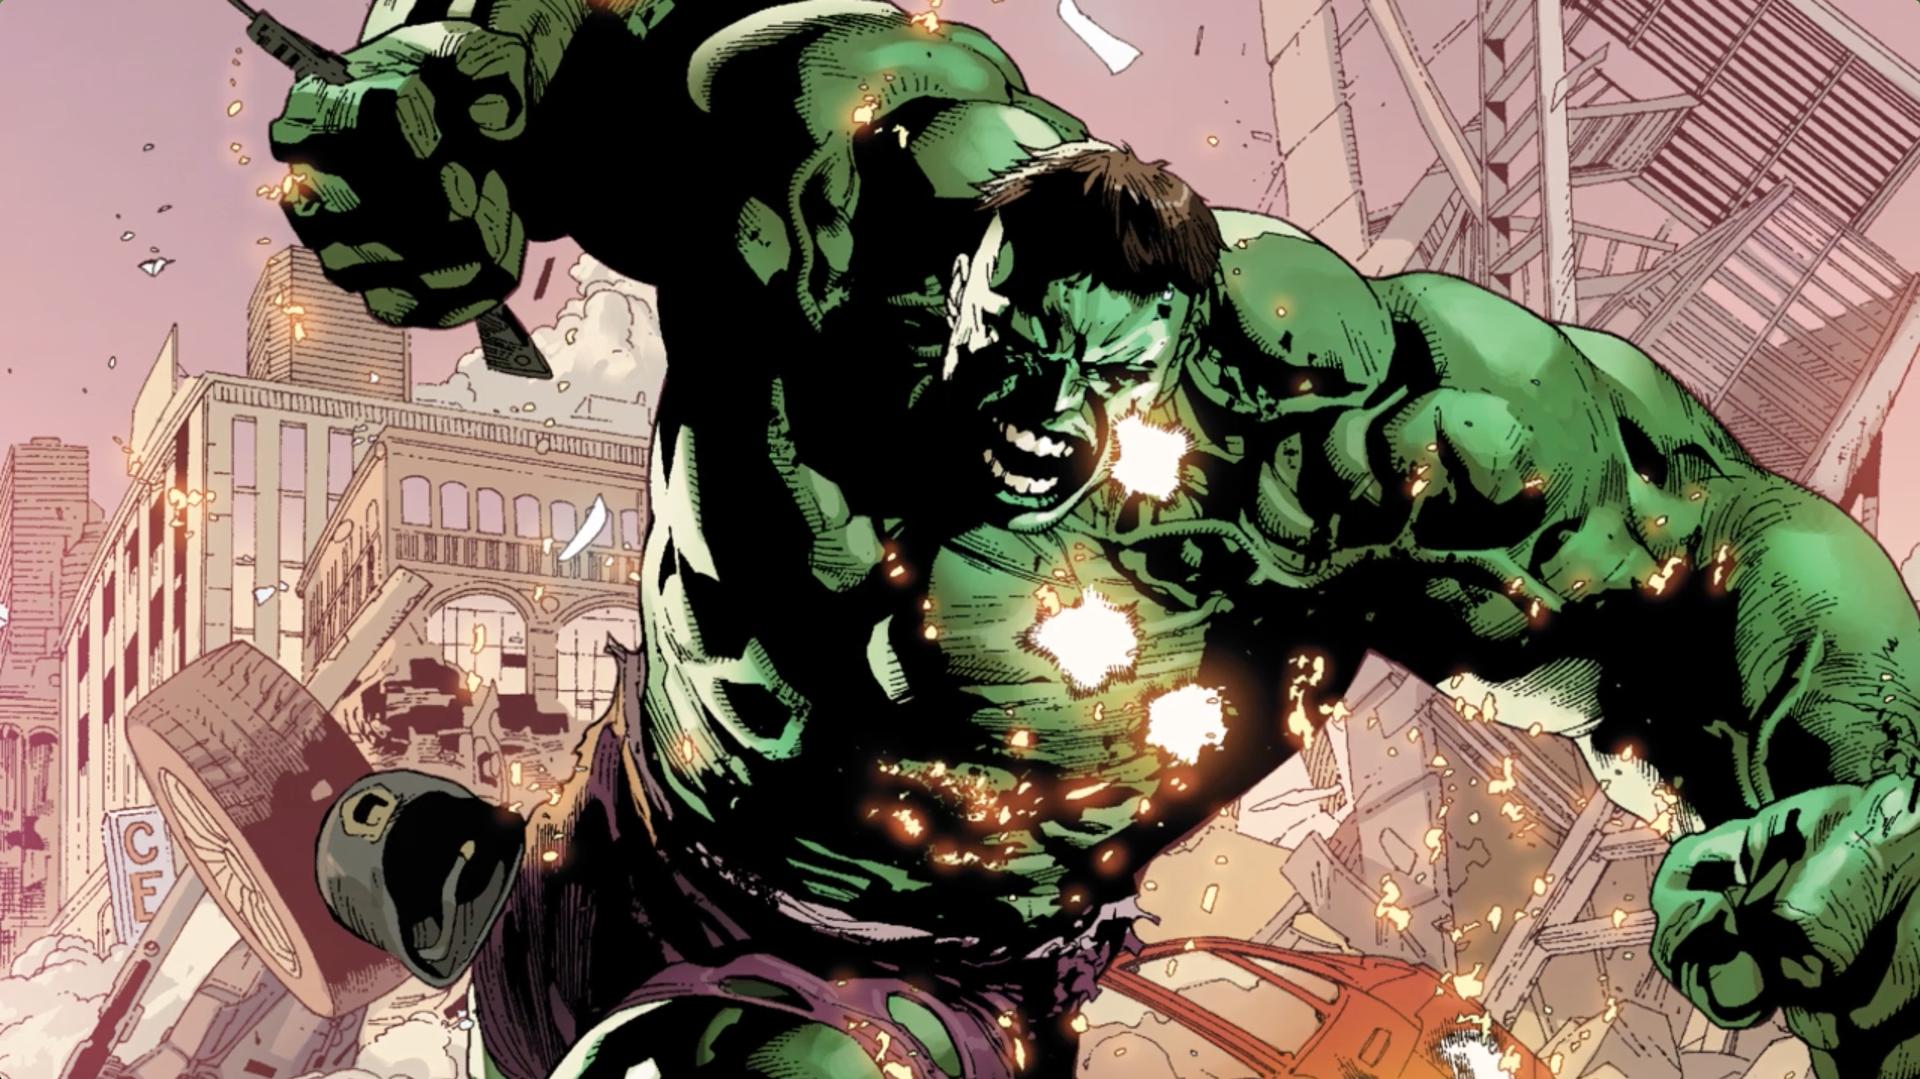 Hulk - Héroes en un minuto